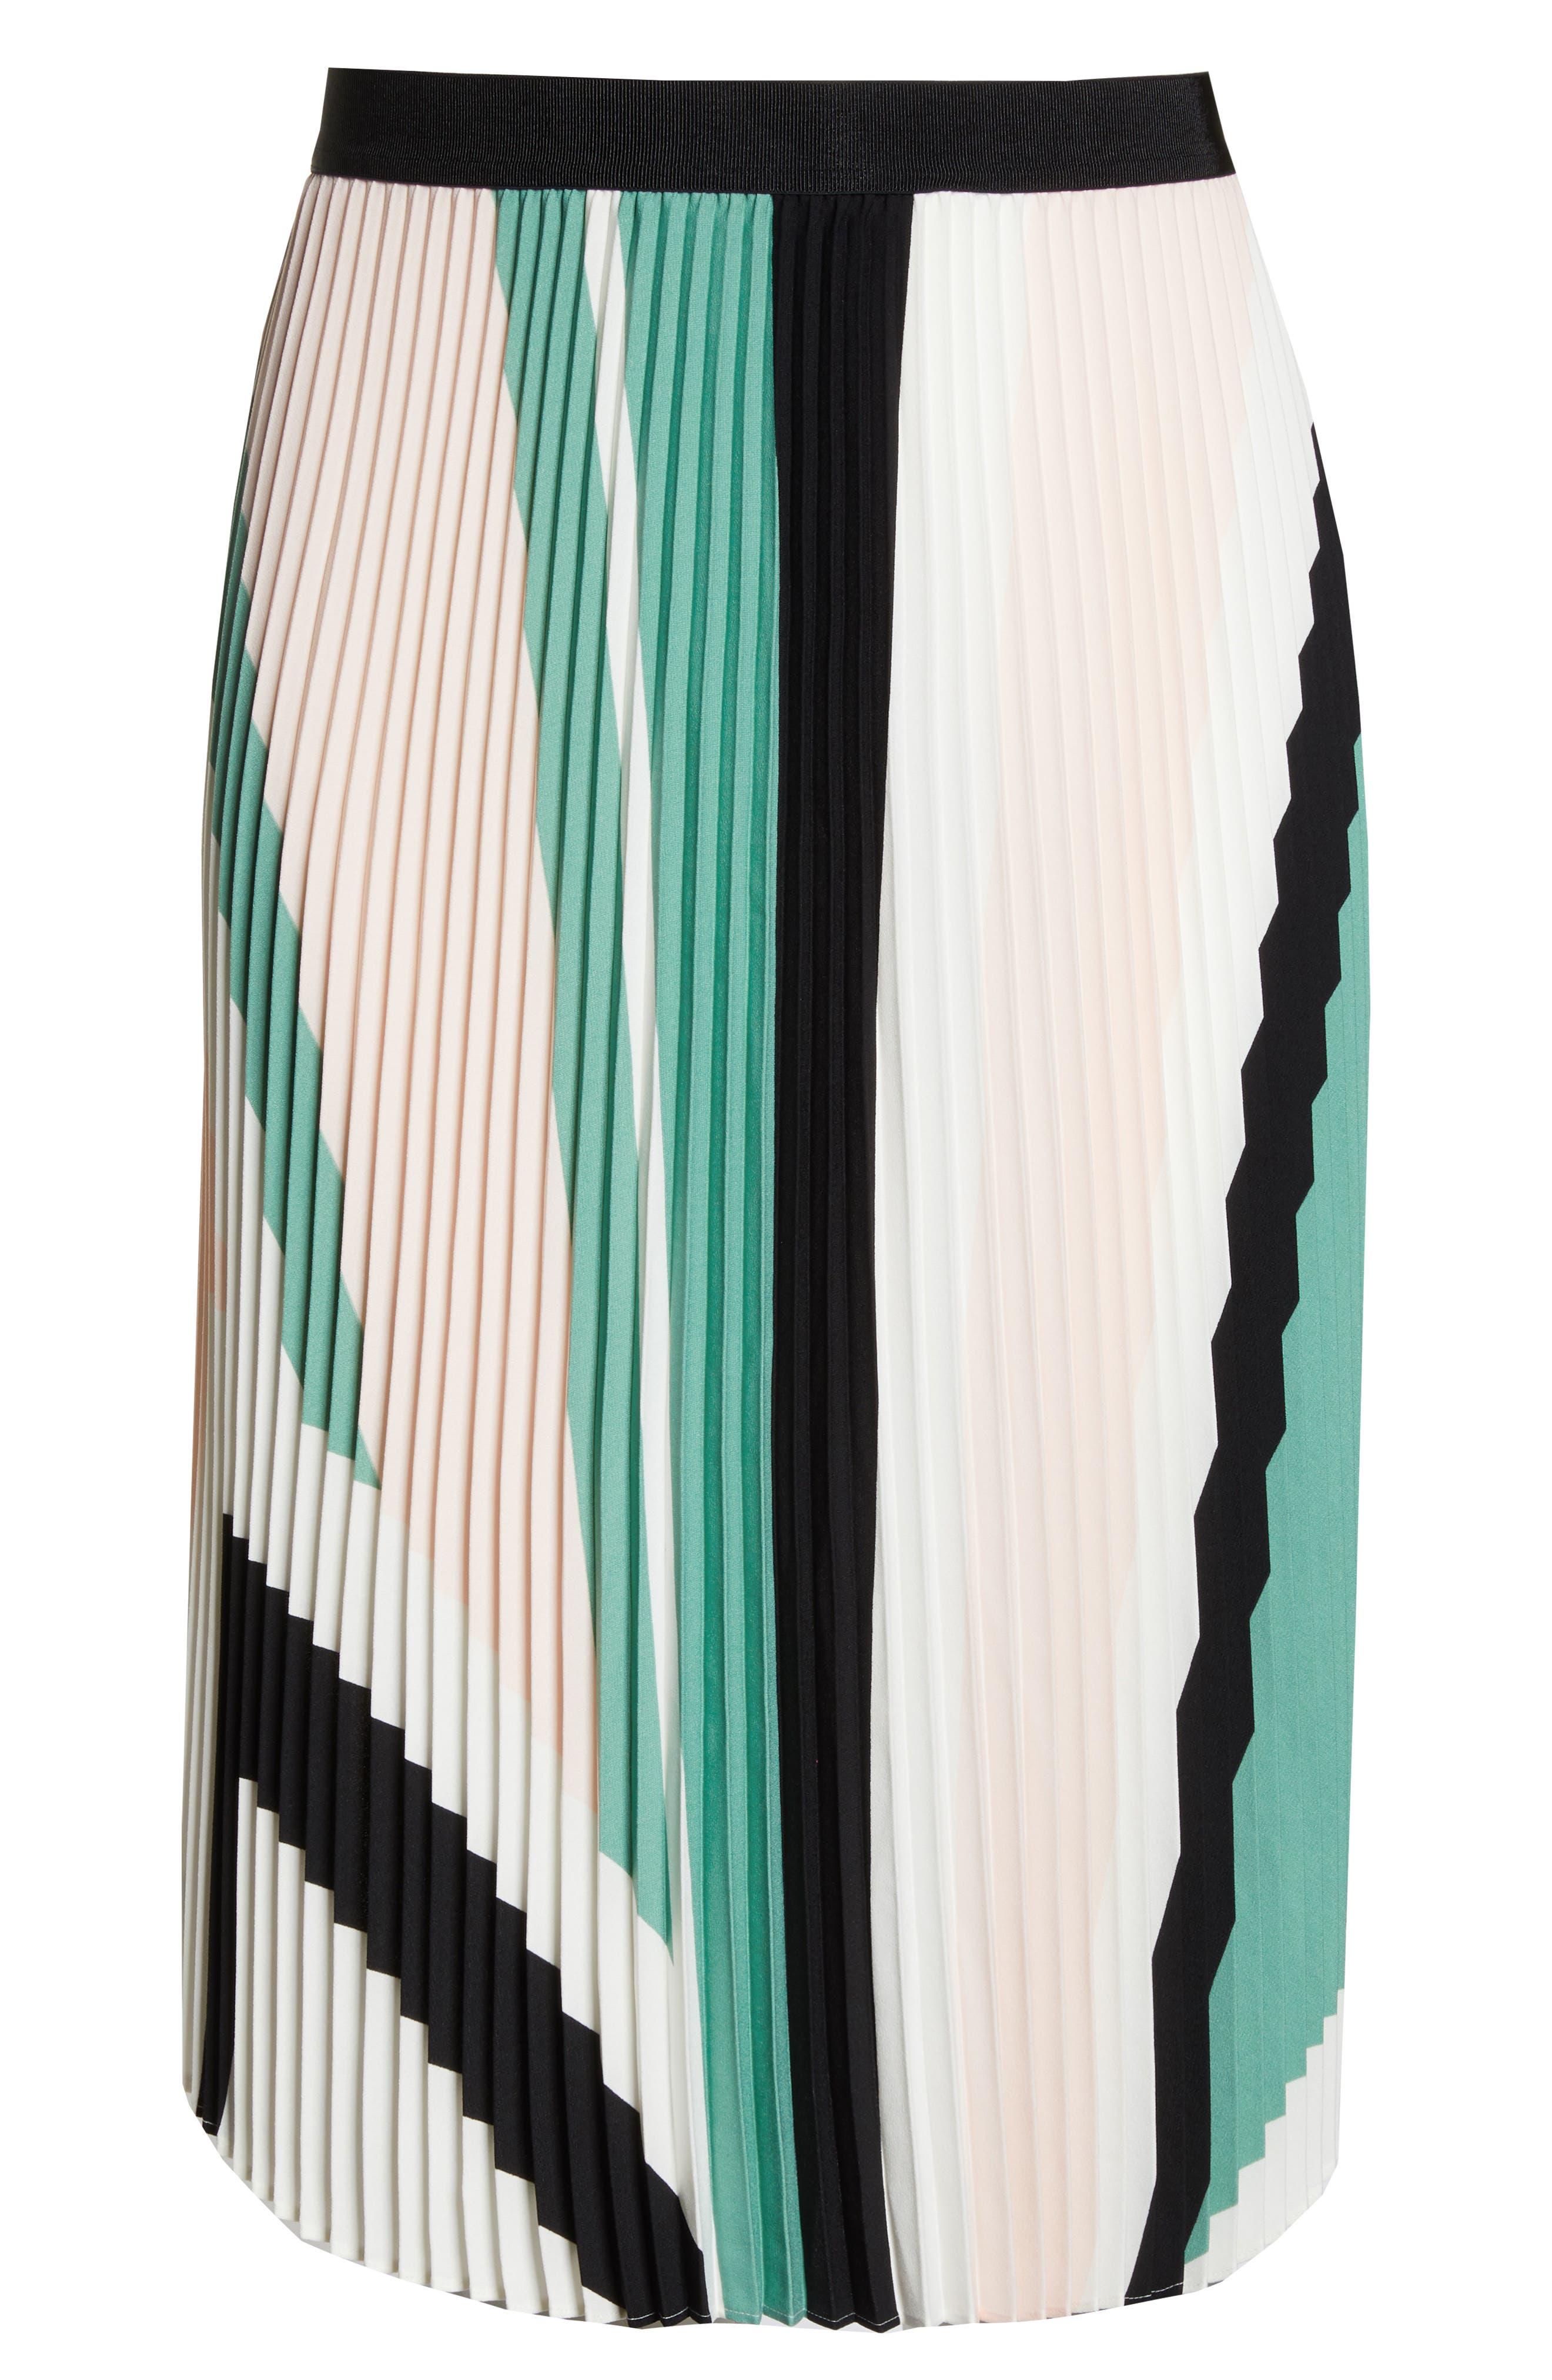 LEITH, Pleated Midi Skirt, Alternate thumbnail 12, color, PINK CHINTZ TRIANGLE STRIPE